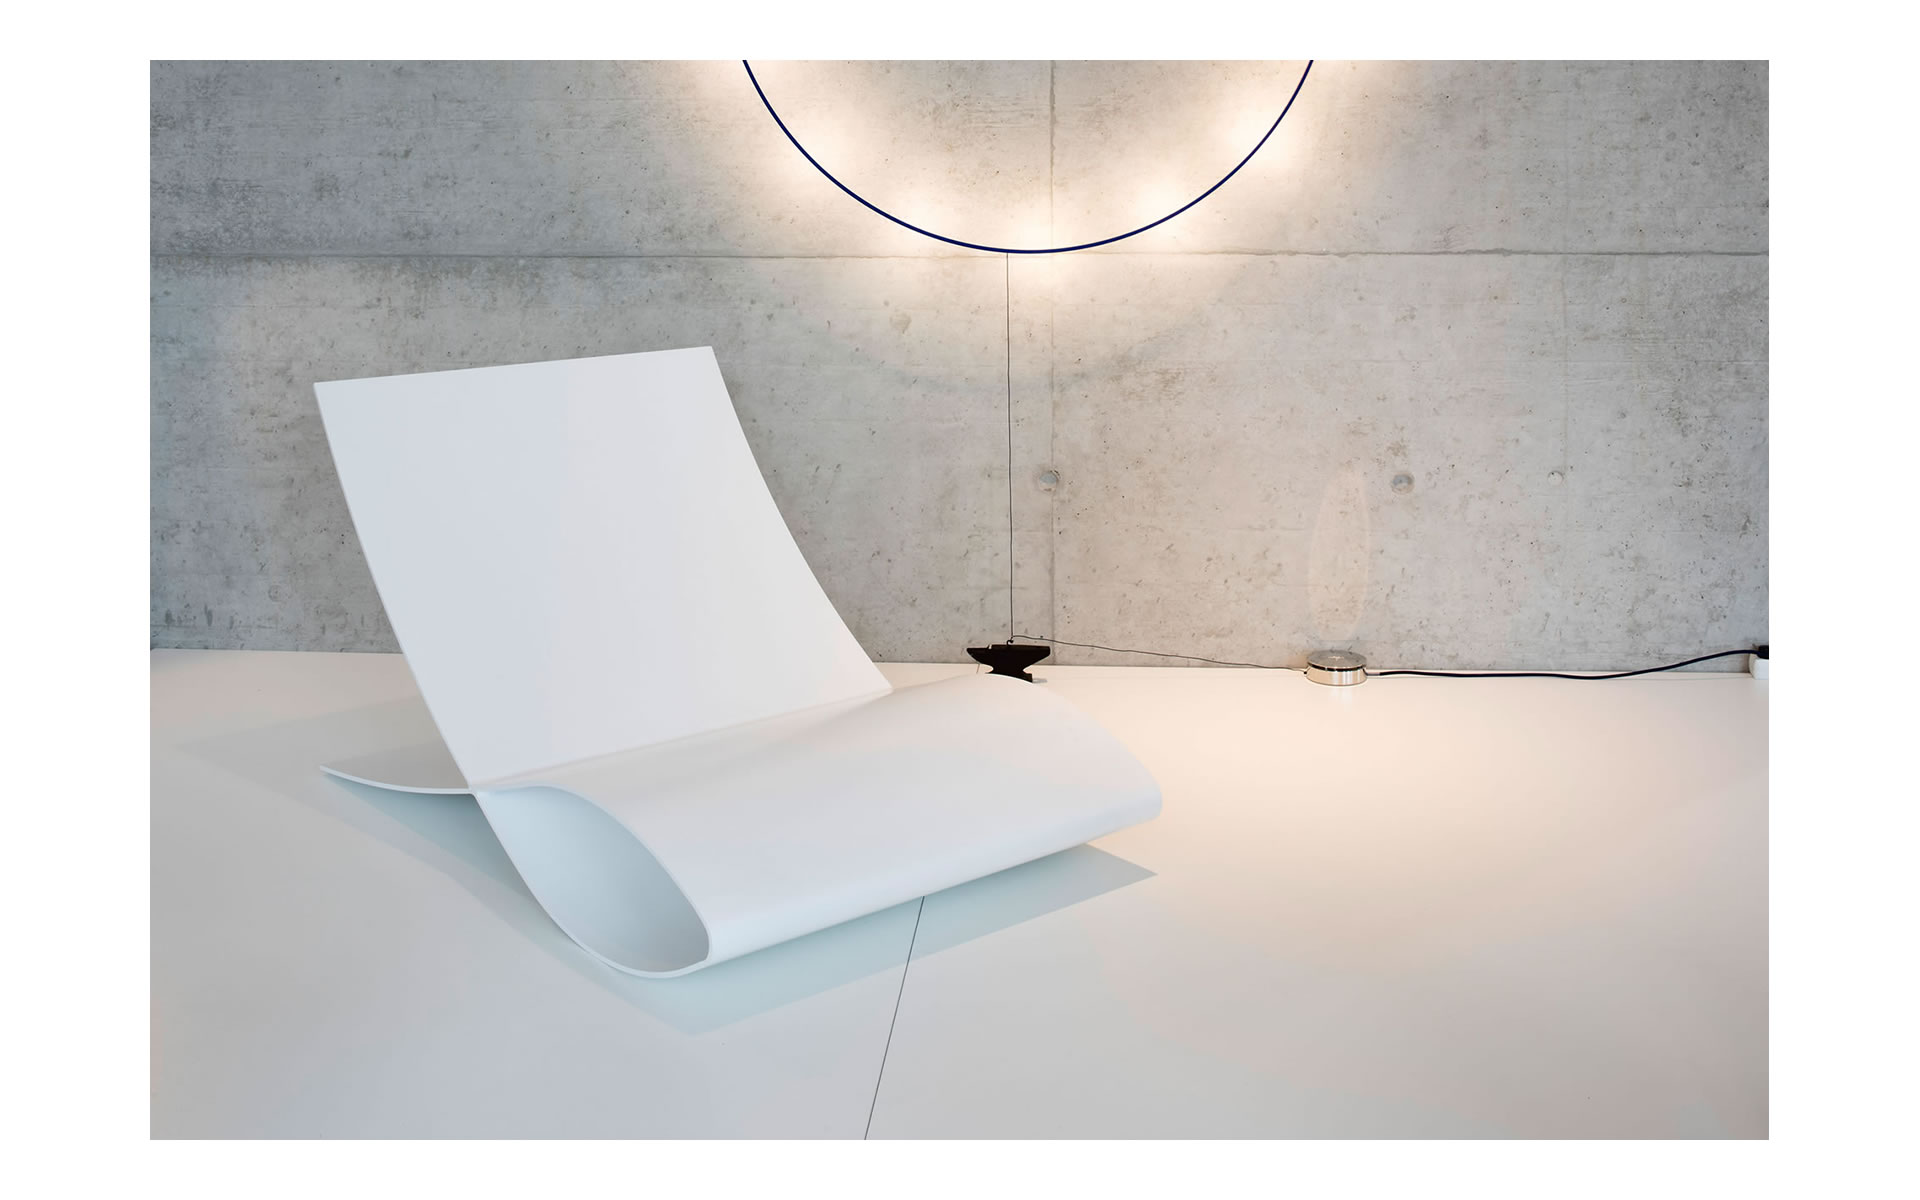 Sessel Weiss Hochglanz Lack Lounge Wartebereich Empfang Modern Bsk  Nuernberg Designmoebel